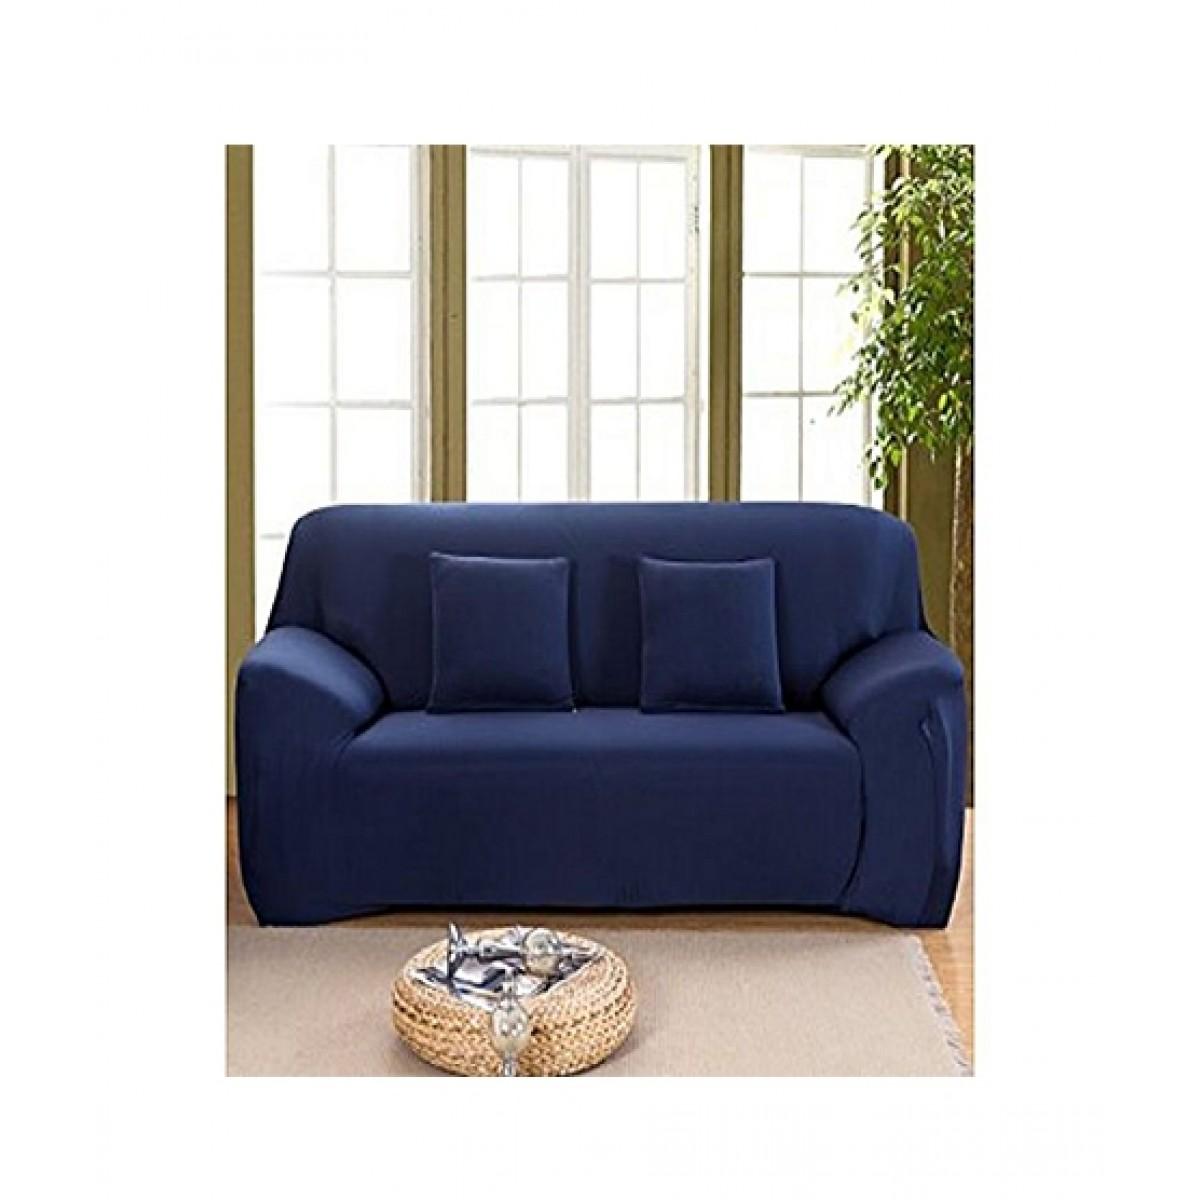 K Linen 7 Seater Sofa Cover Price In Pakistan Buy K Linen 7 Seater